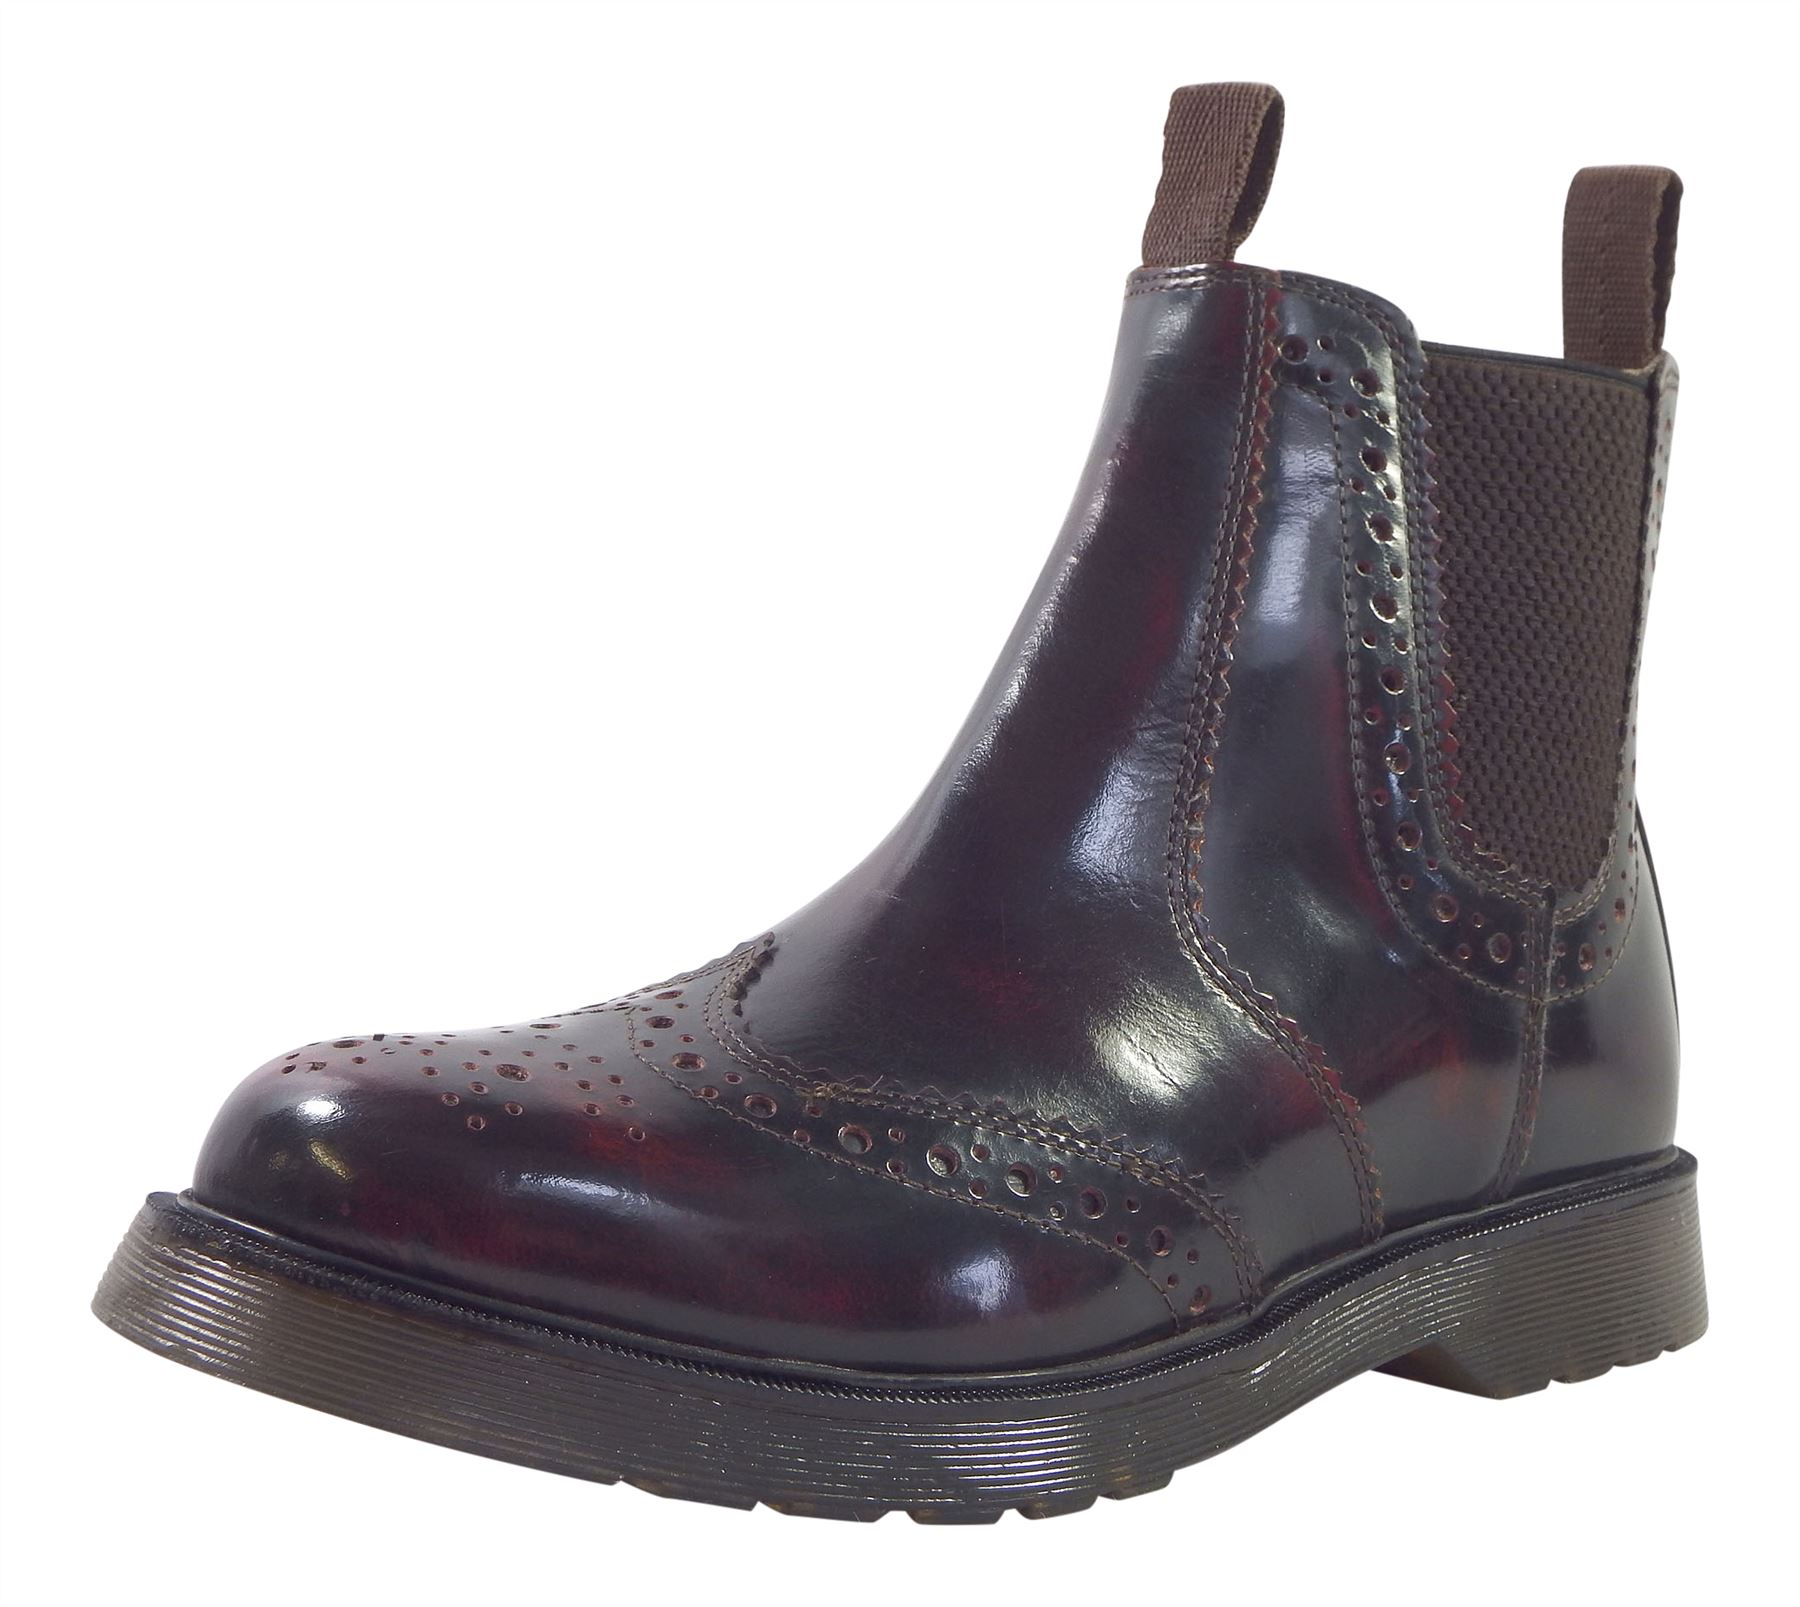 Premium Hi Shine Leather Brogue Optional Dealer Chelsea Boots + Optional Brogue Oxblood Polish 125df8